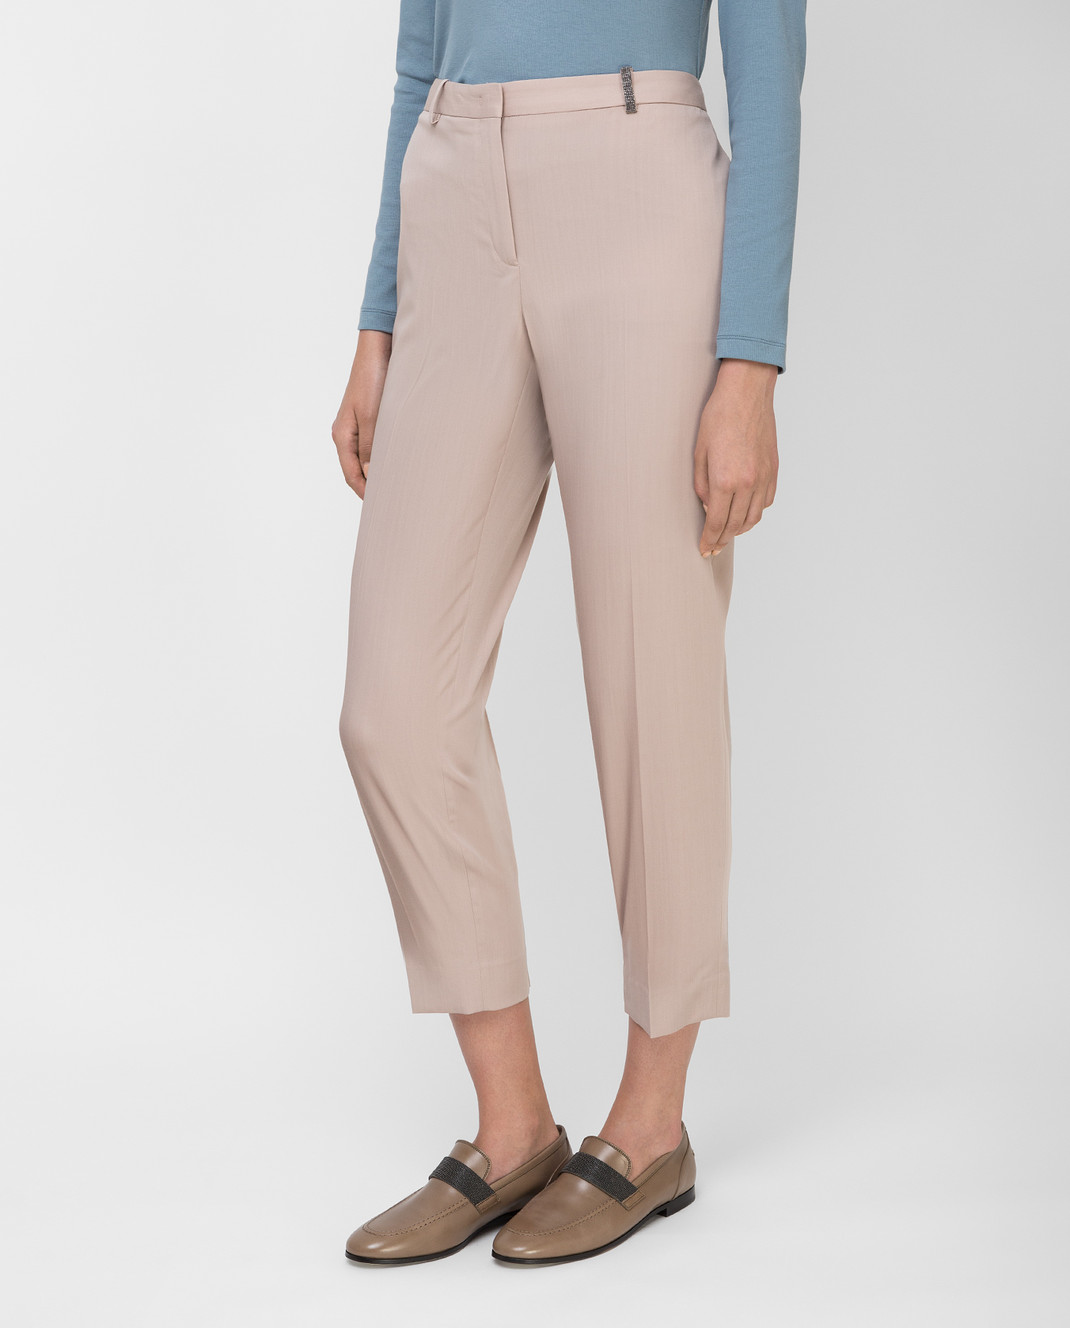 Fabiana Filippi Бежевые брюки из шерсти изображение 3